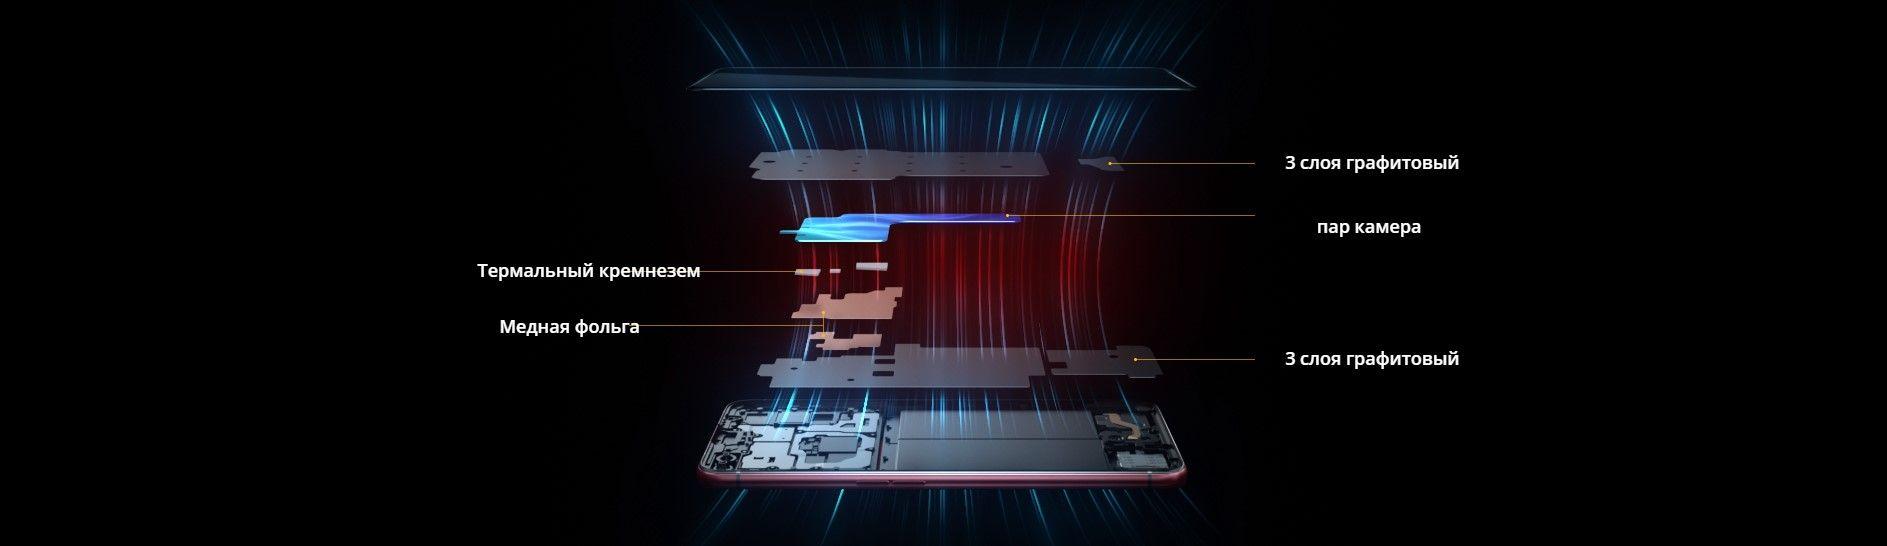 Realme X50 Pro система охлаждения